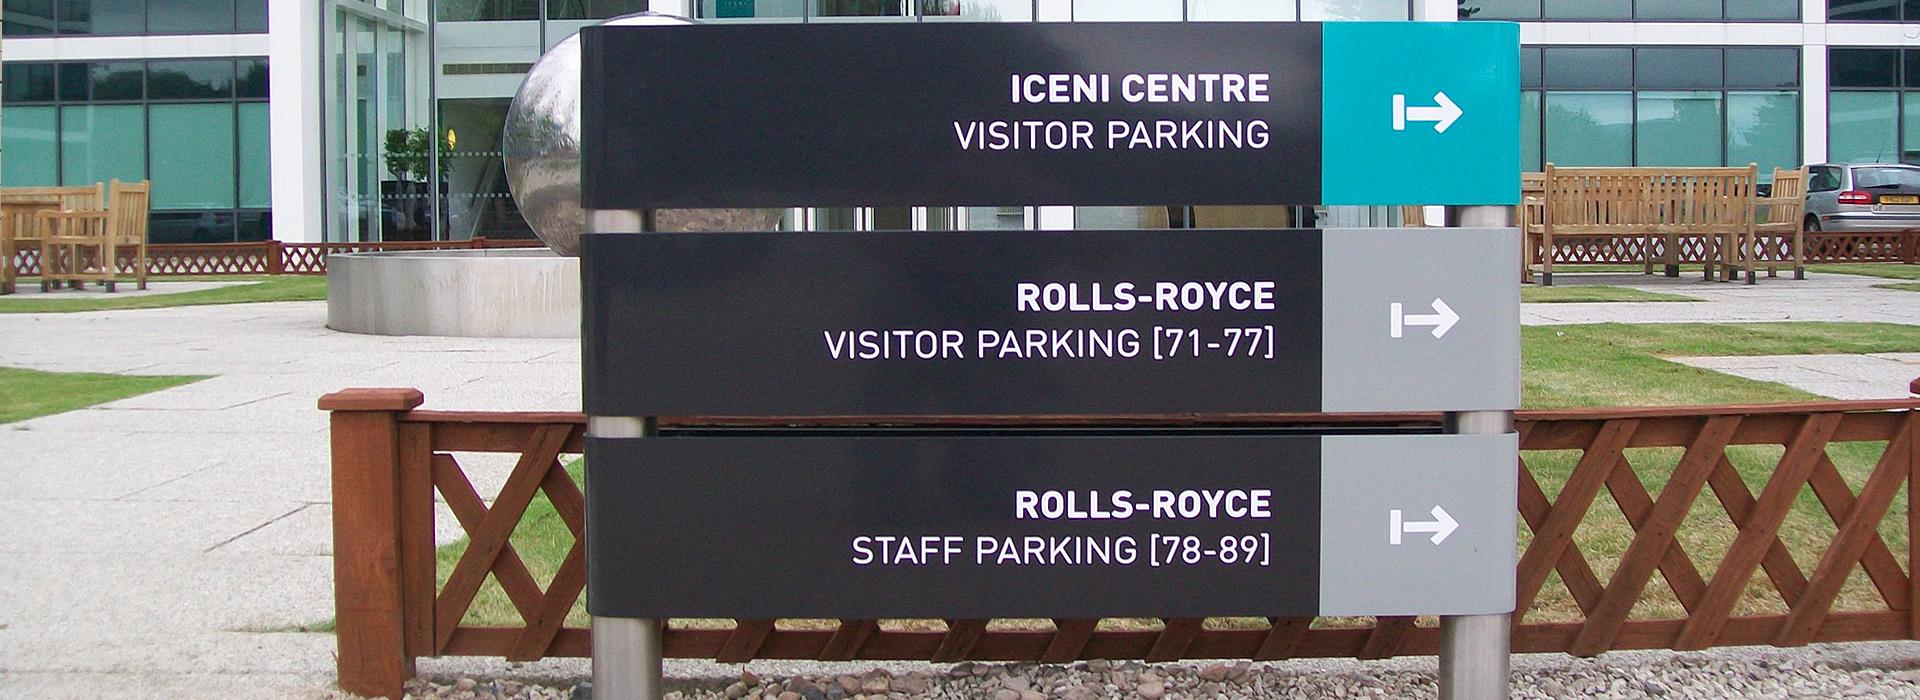 Directional signage